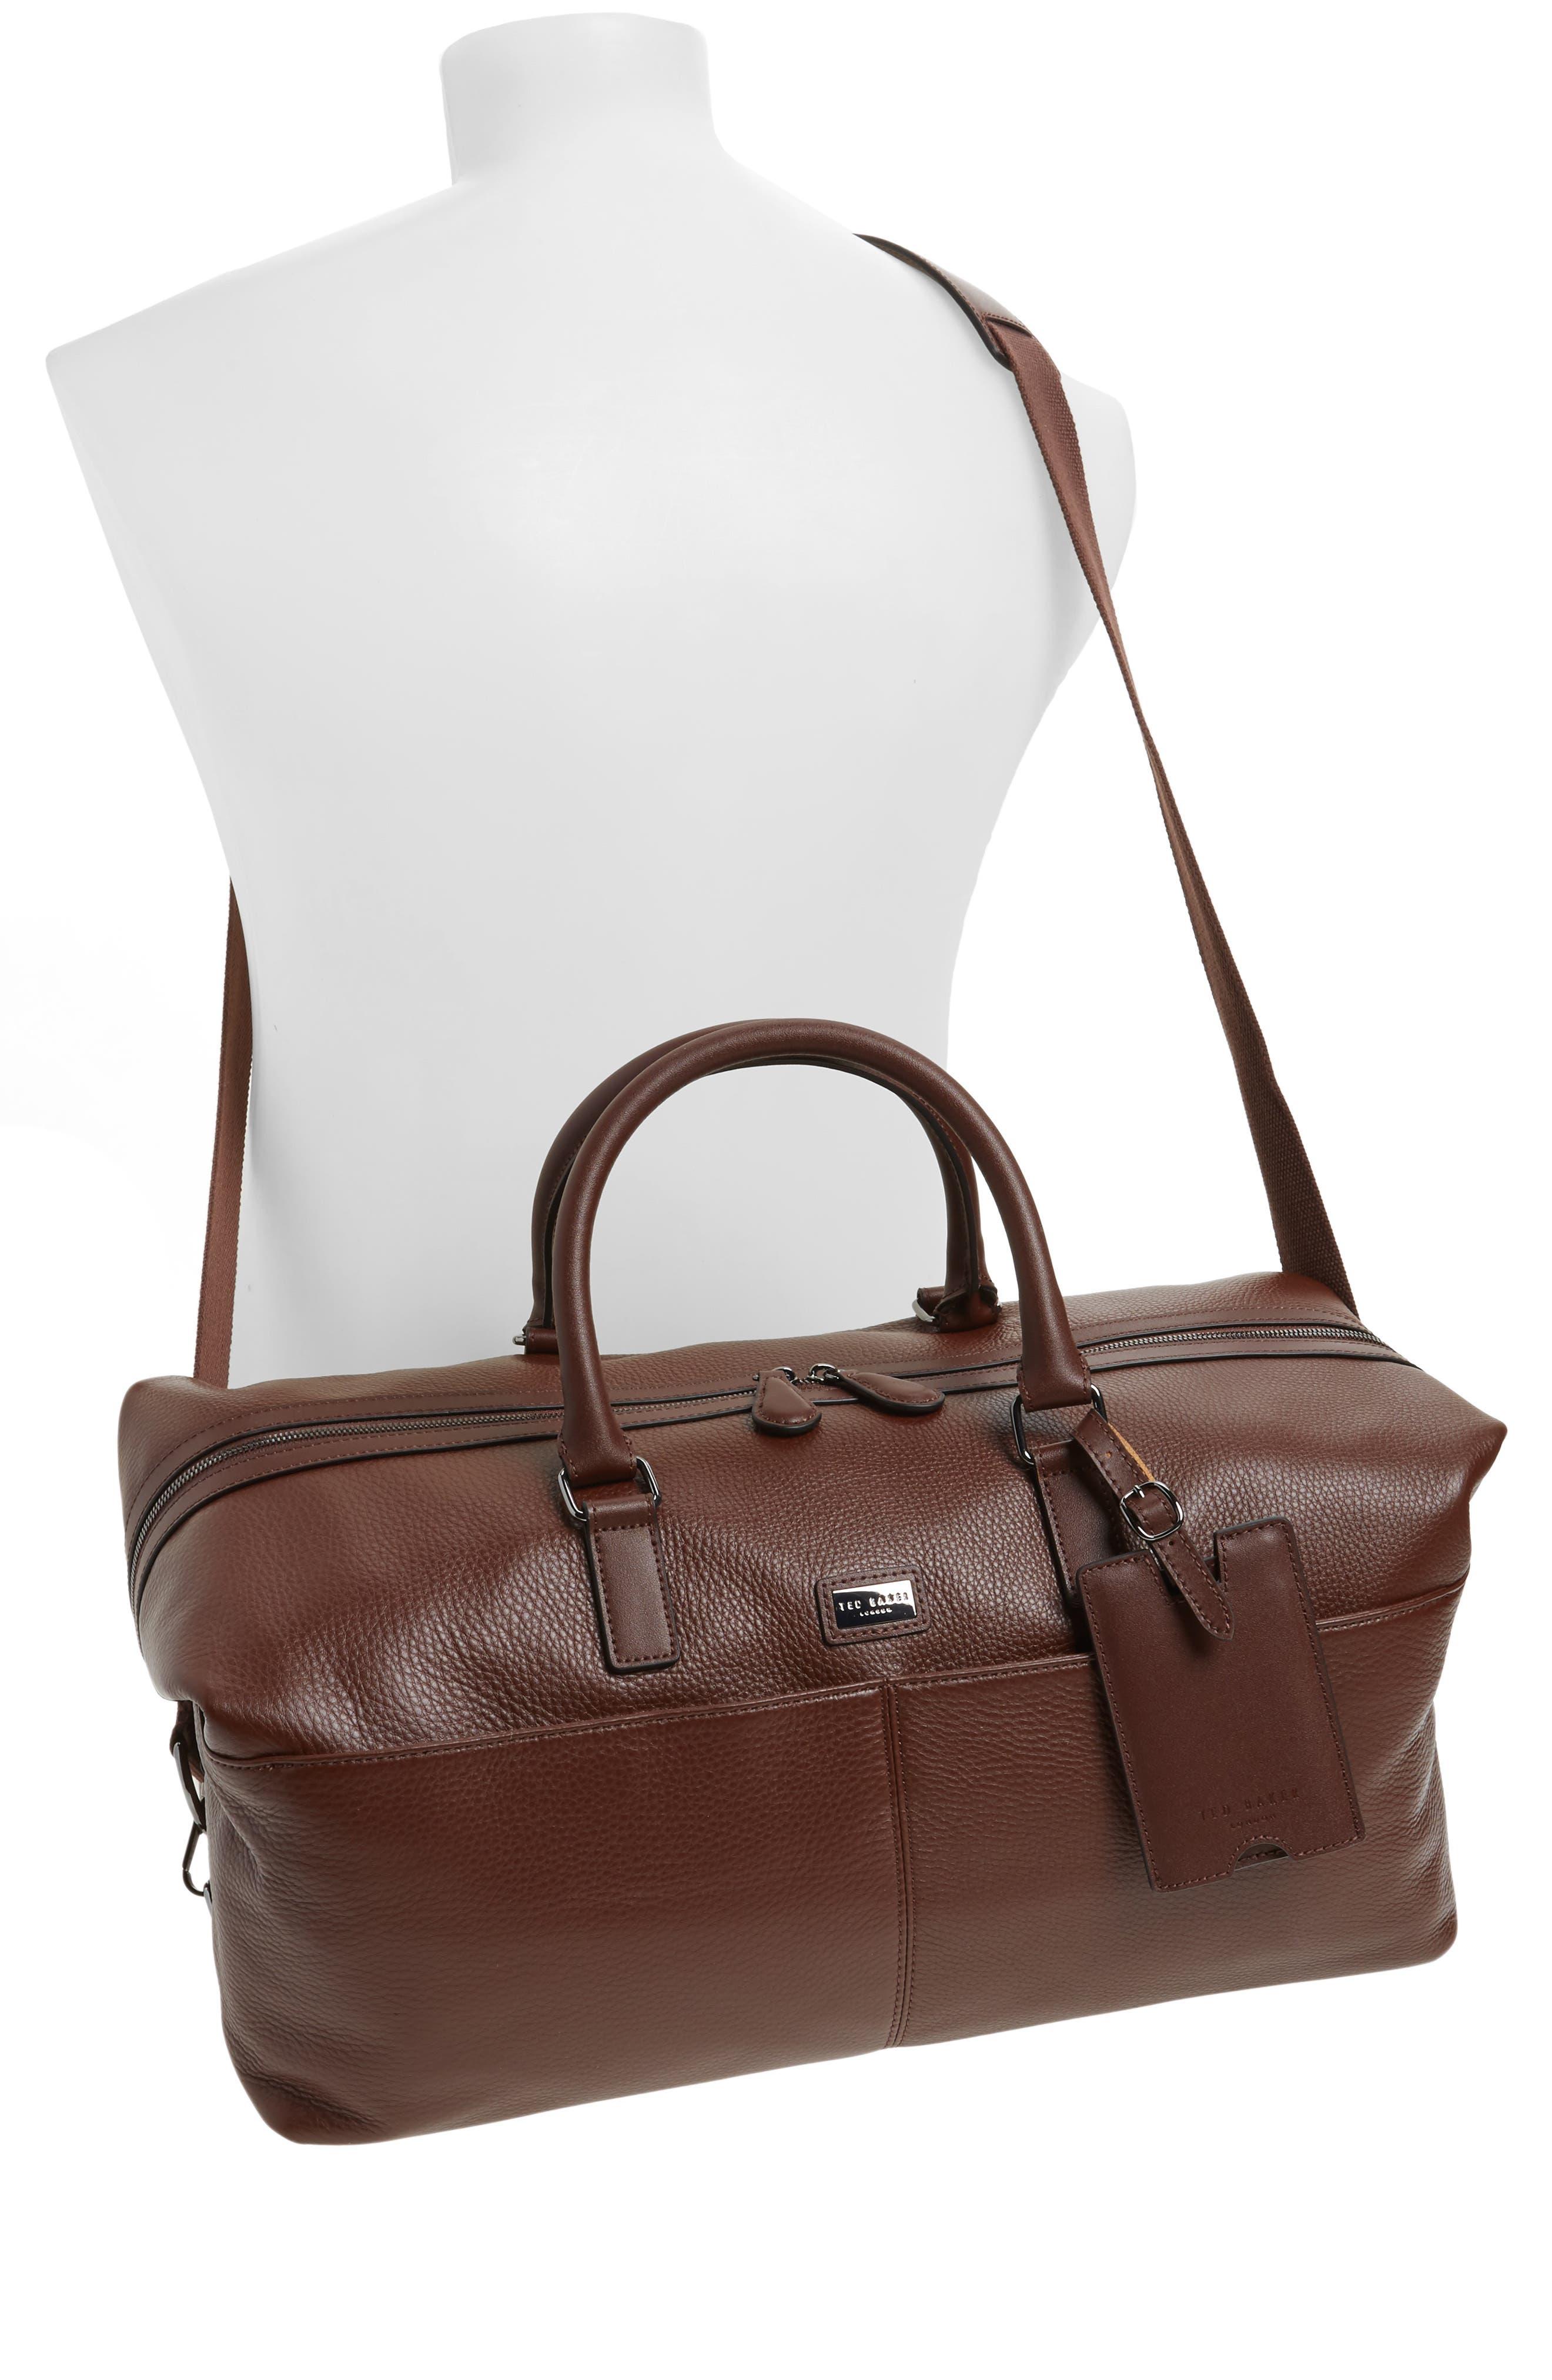 Leather Duffel Bag,                             Alternate thumbnail 2, color,                             217